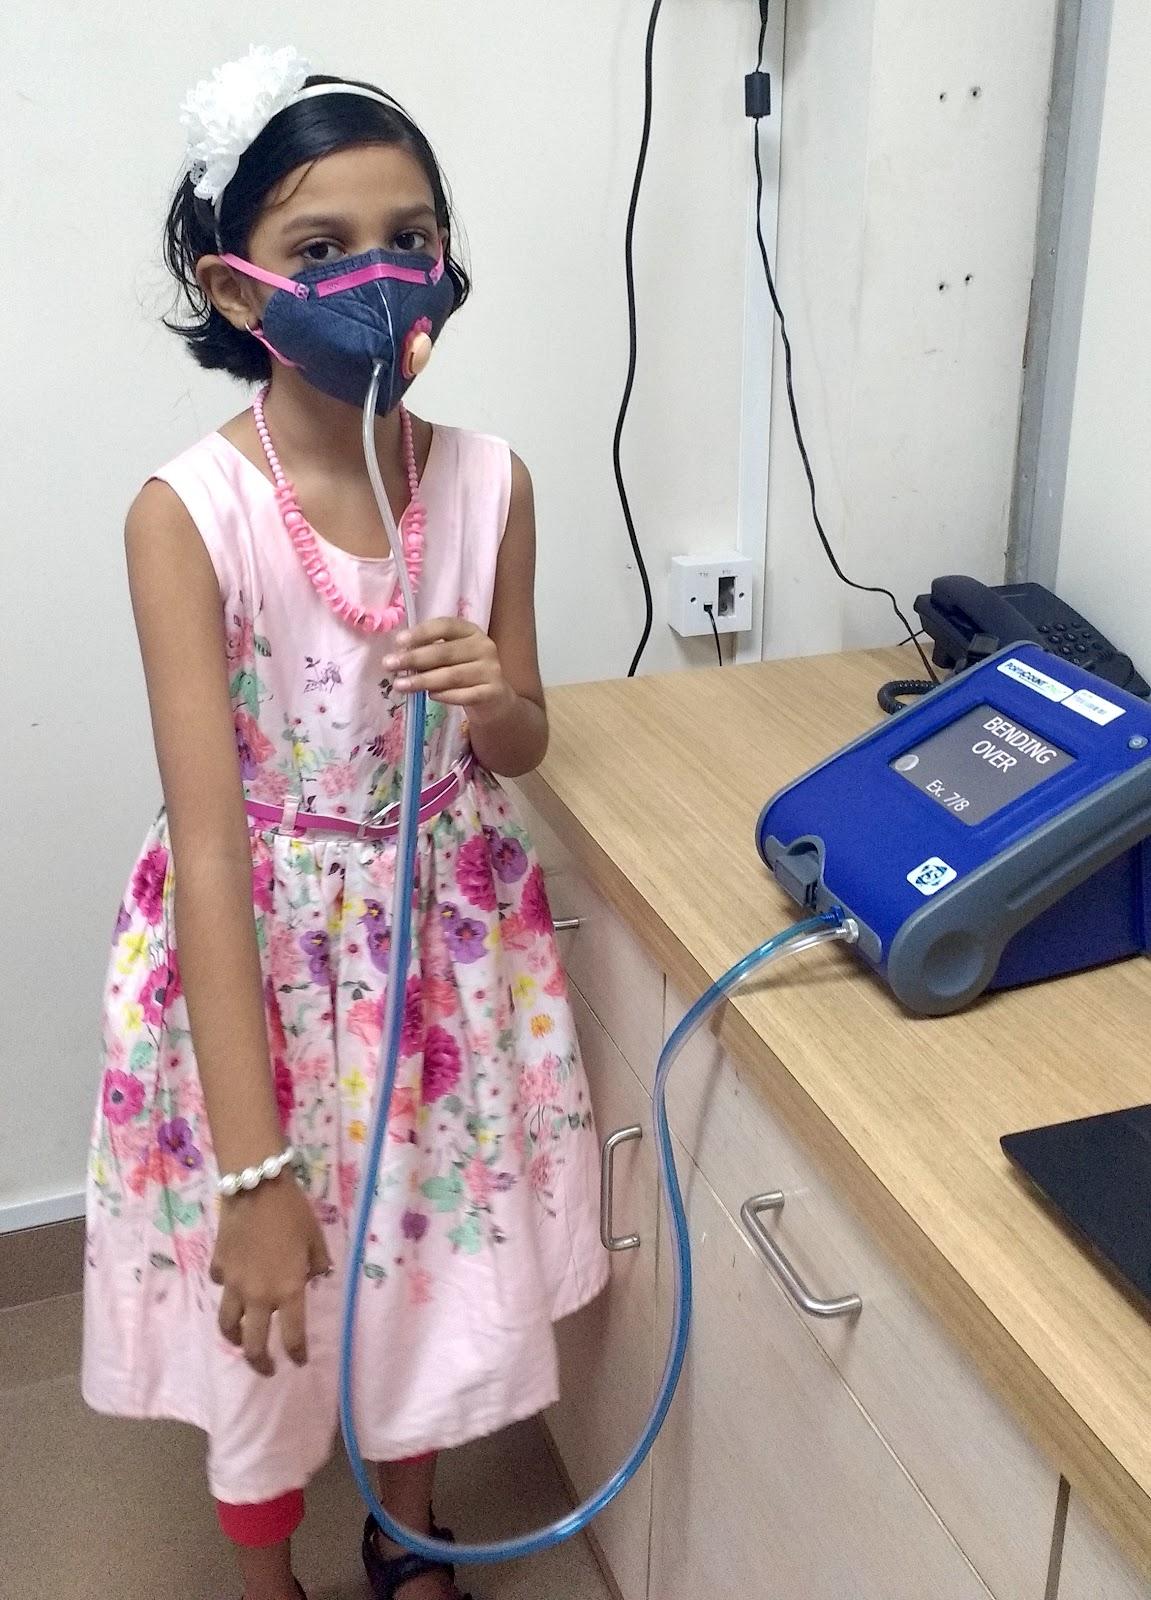 Children's Mask Fit Test